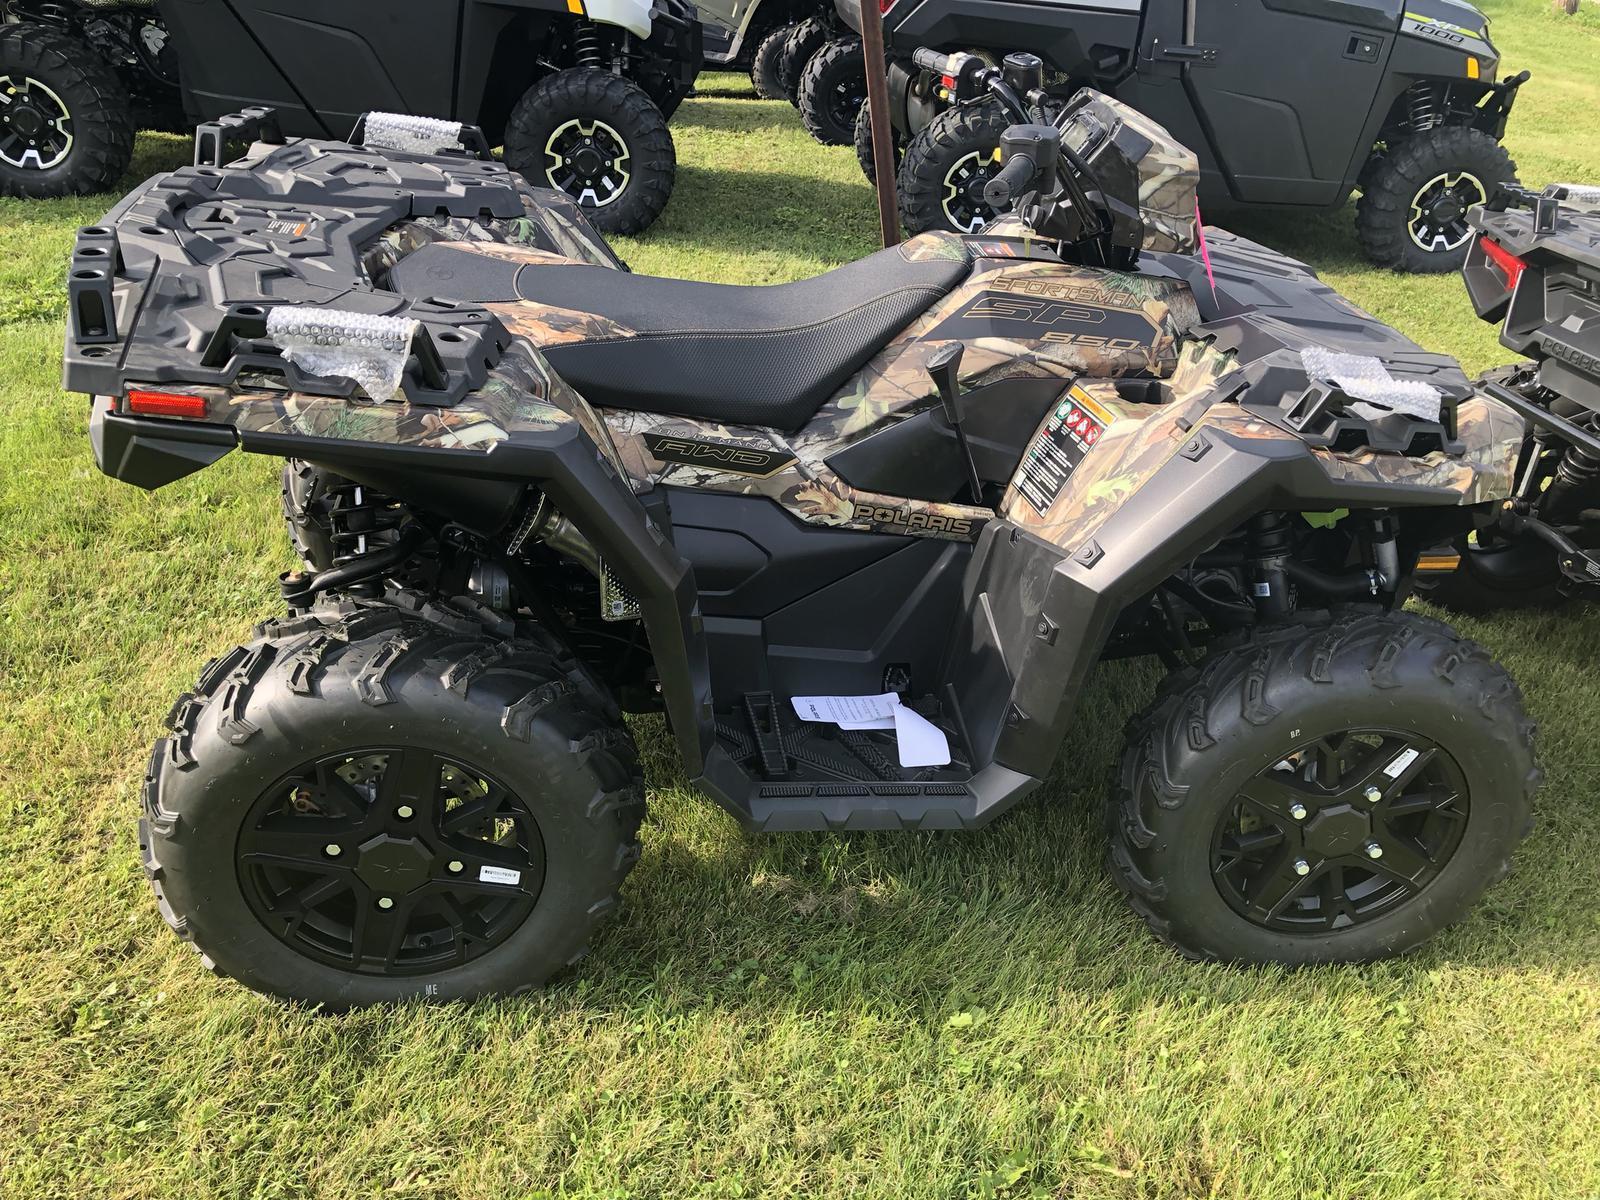 Inventory from Polaris Industries ATV Motor Sports Omaha, NE